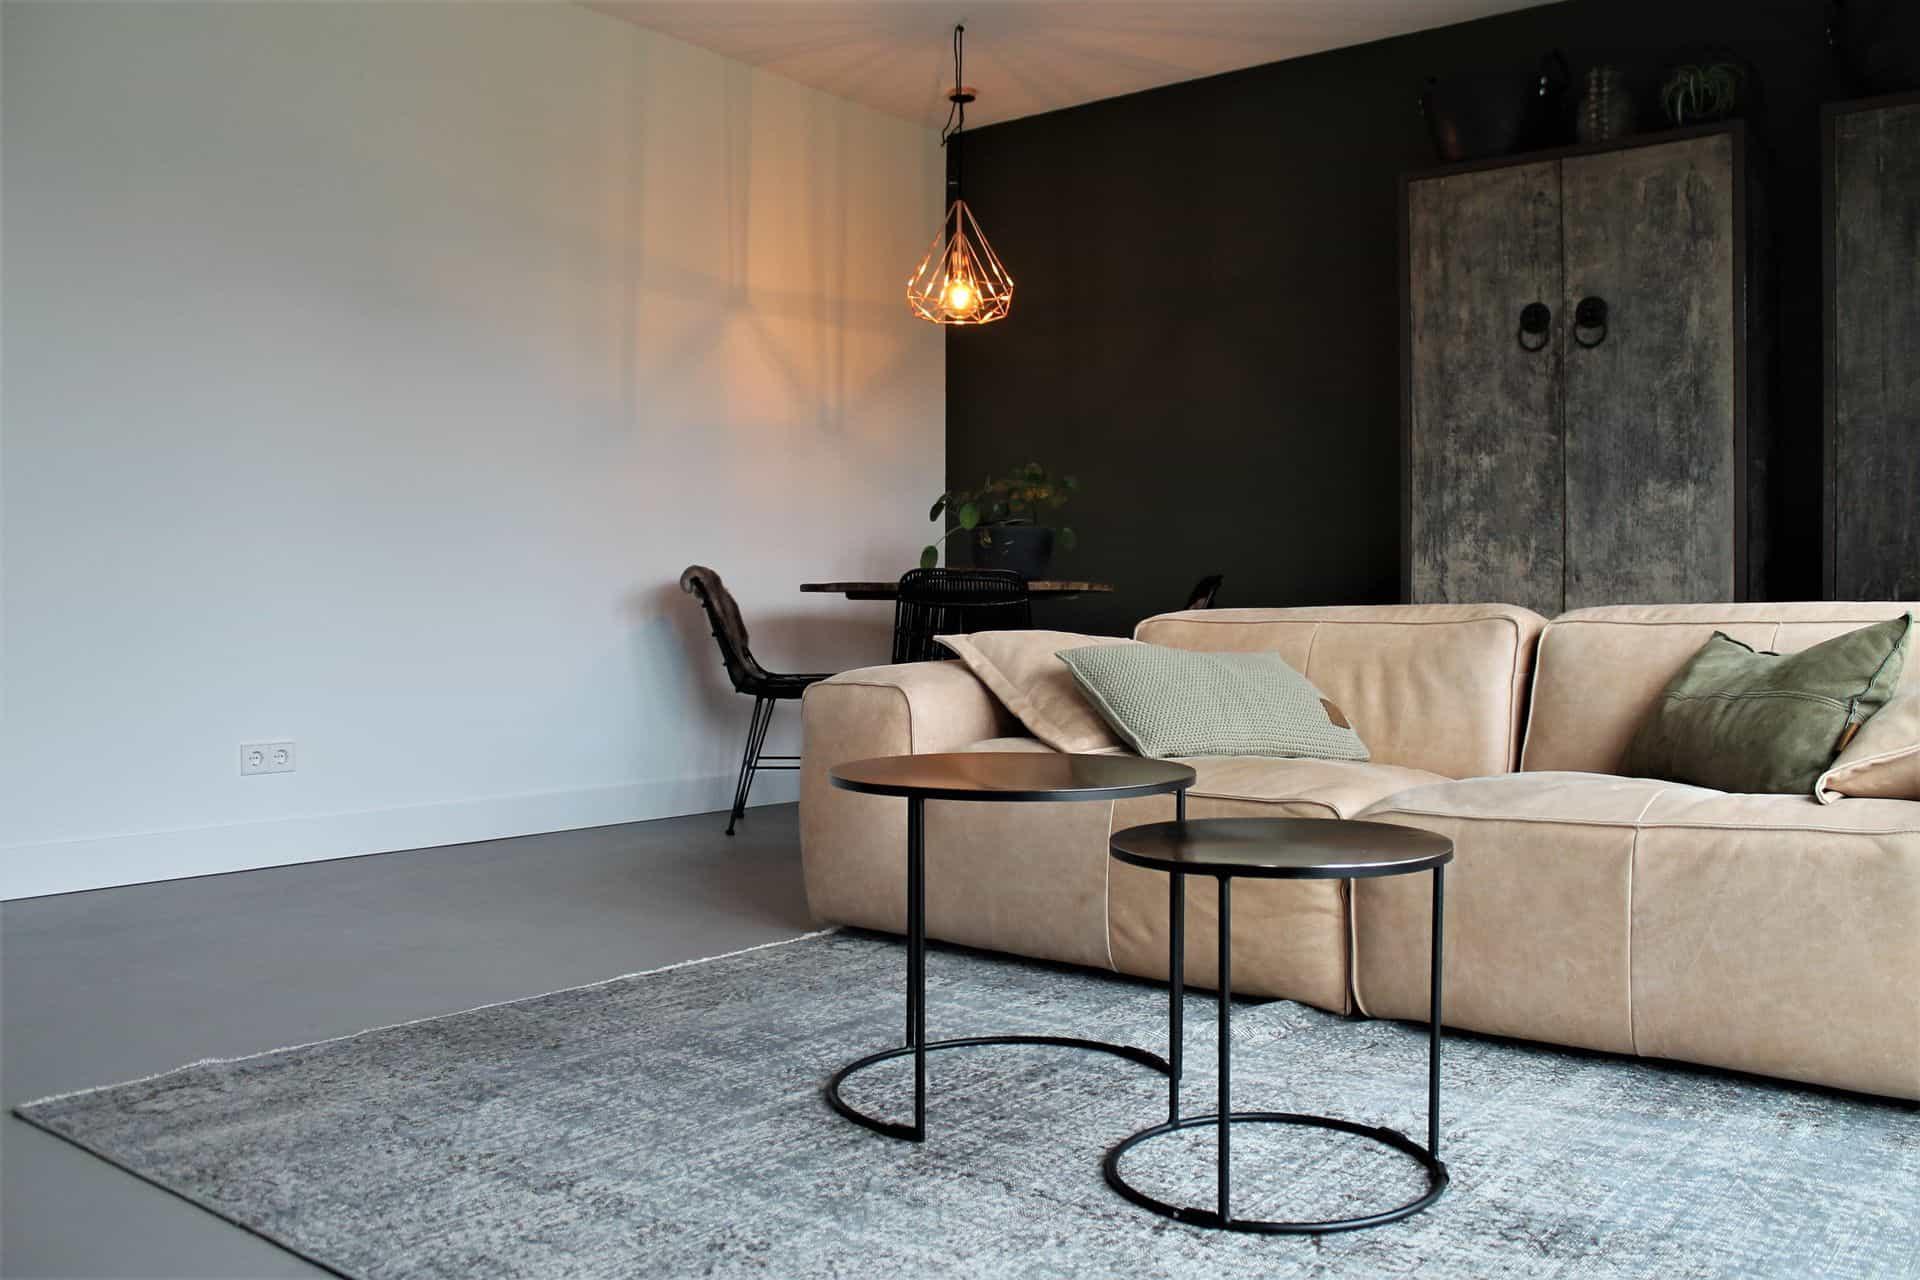 beton ciré in woonkamer